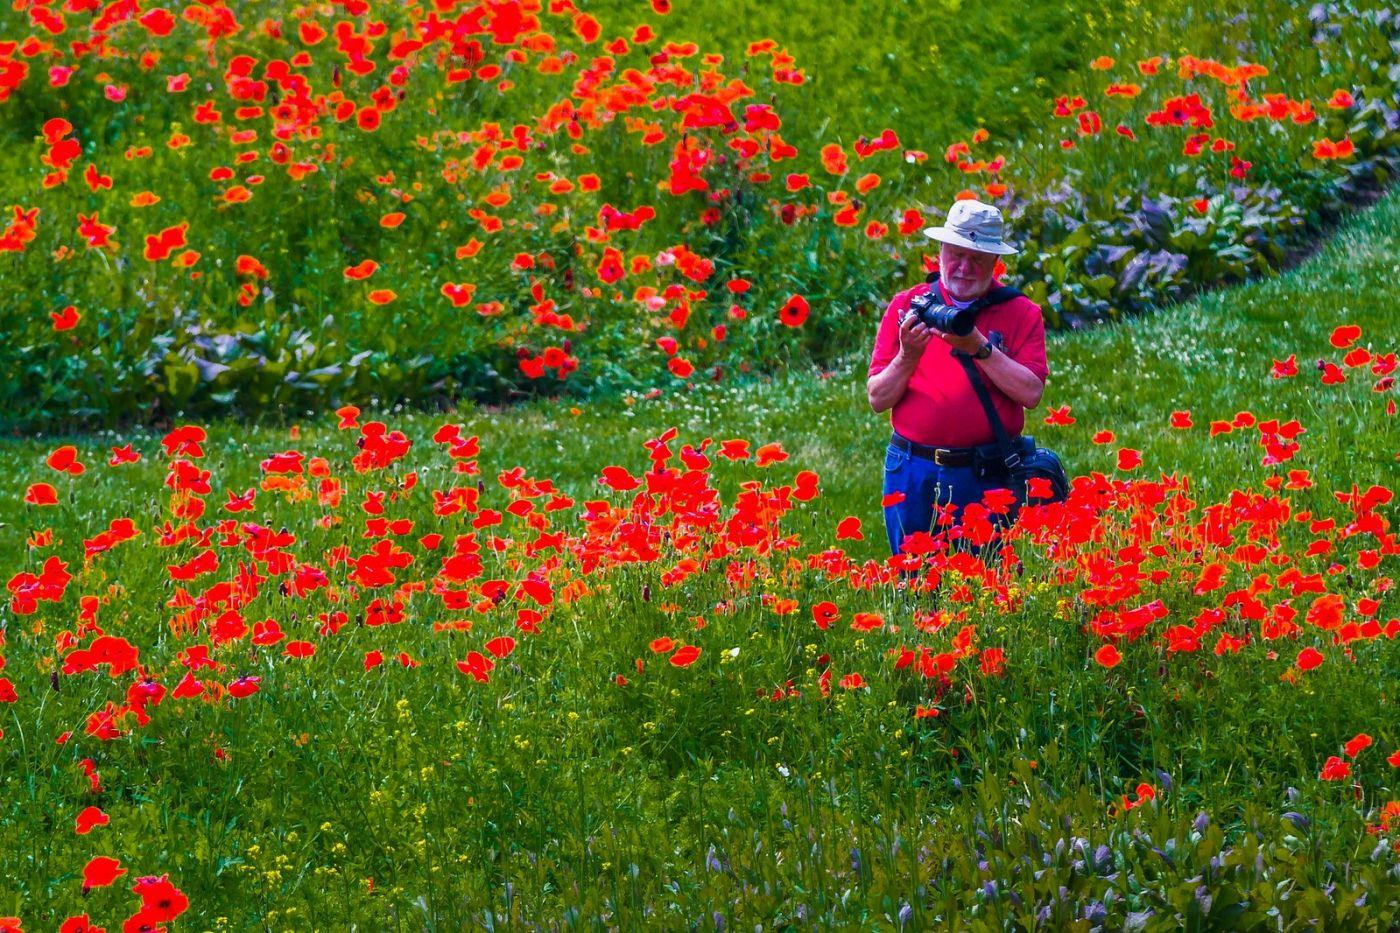 Chanticleer花园,享受大自然_图1-18